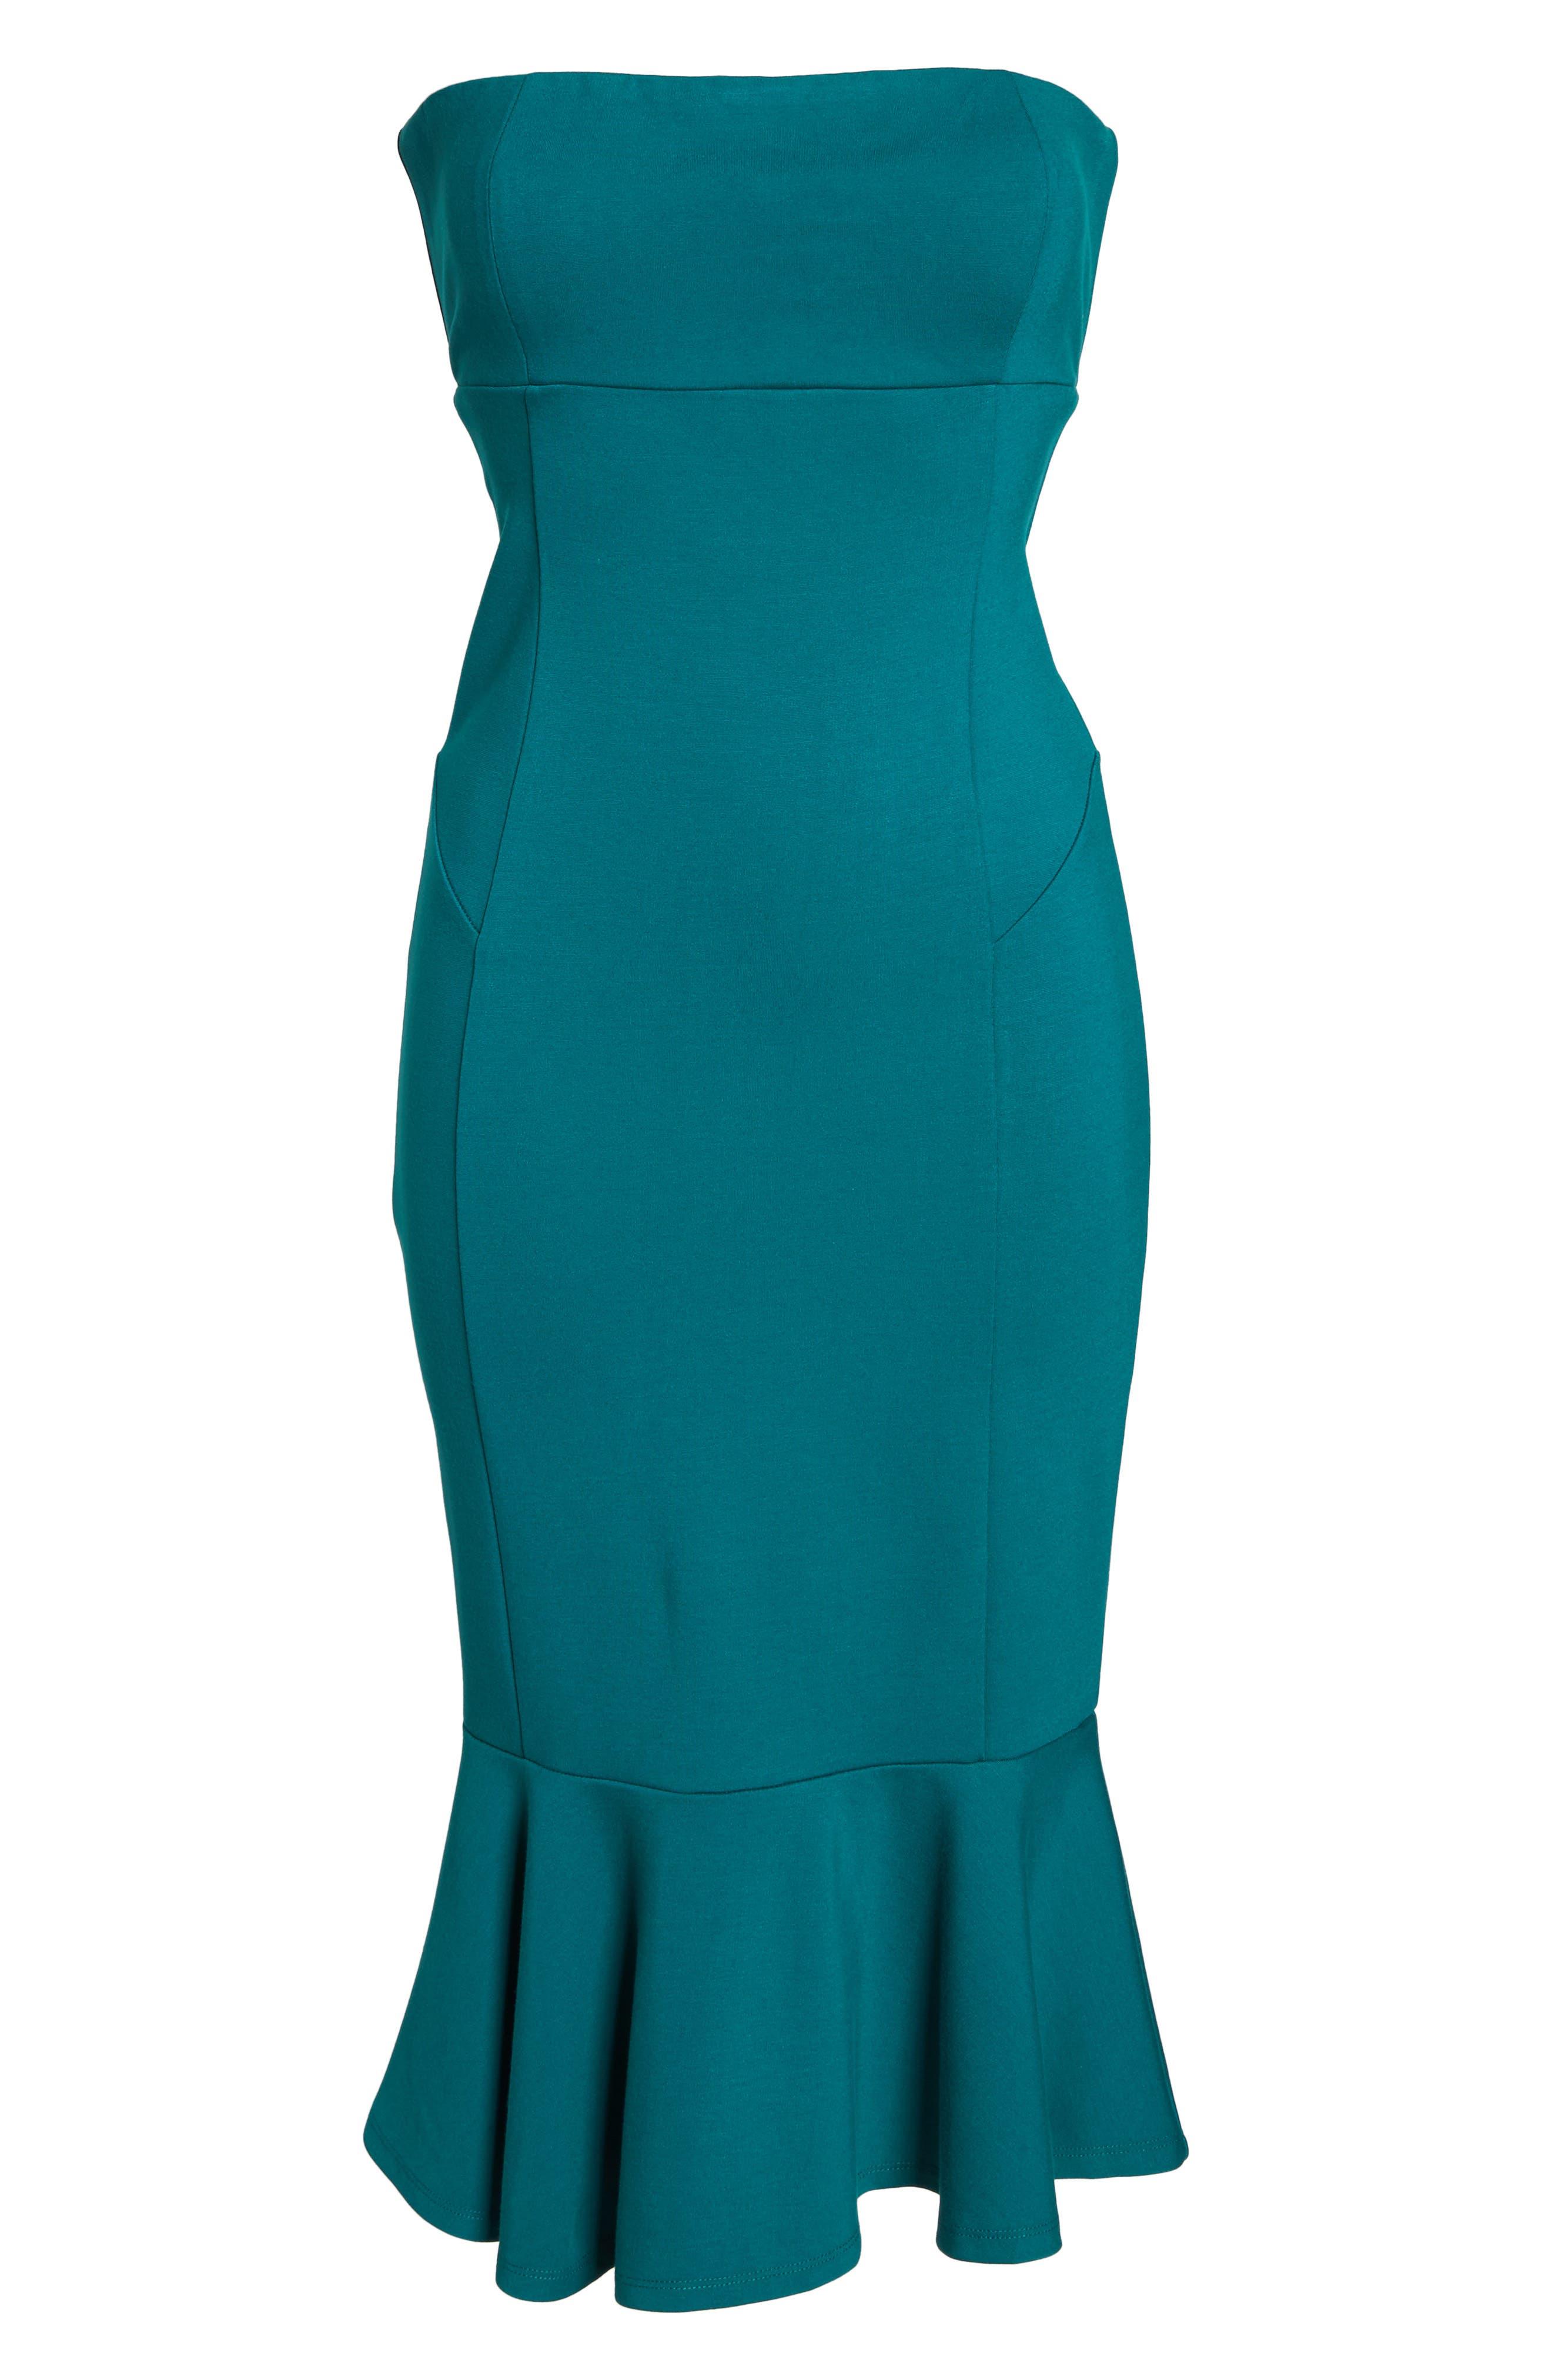 Zabrina Strapless Dress,                             Alternate thumbnail 6, color,                             302